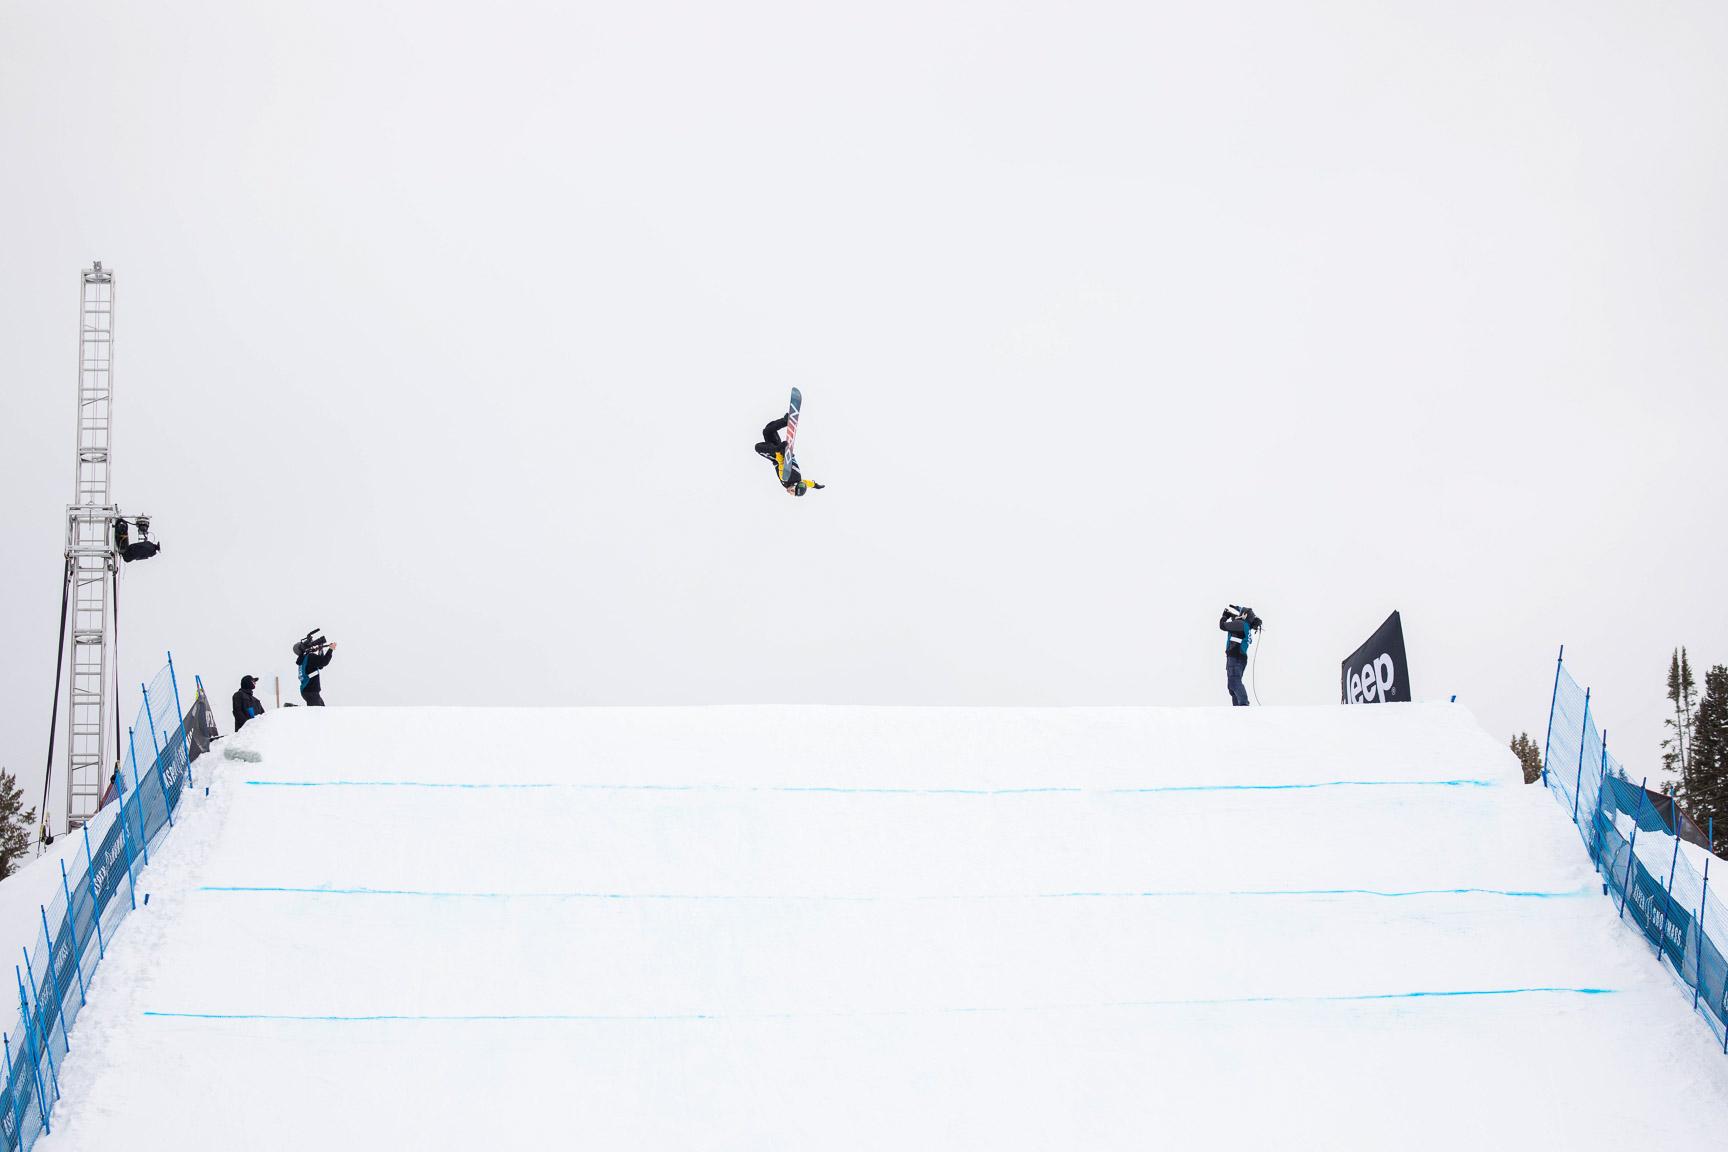 Sven Thorgren, M Snowboard Slopestyle